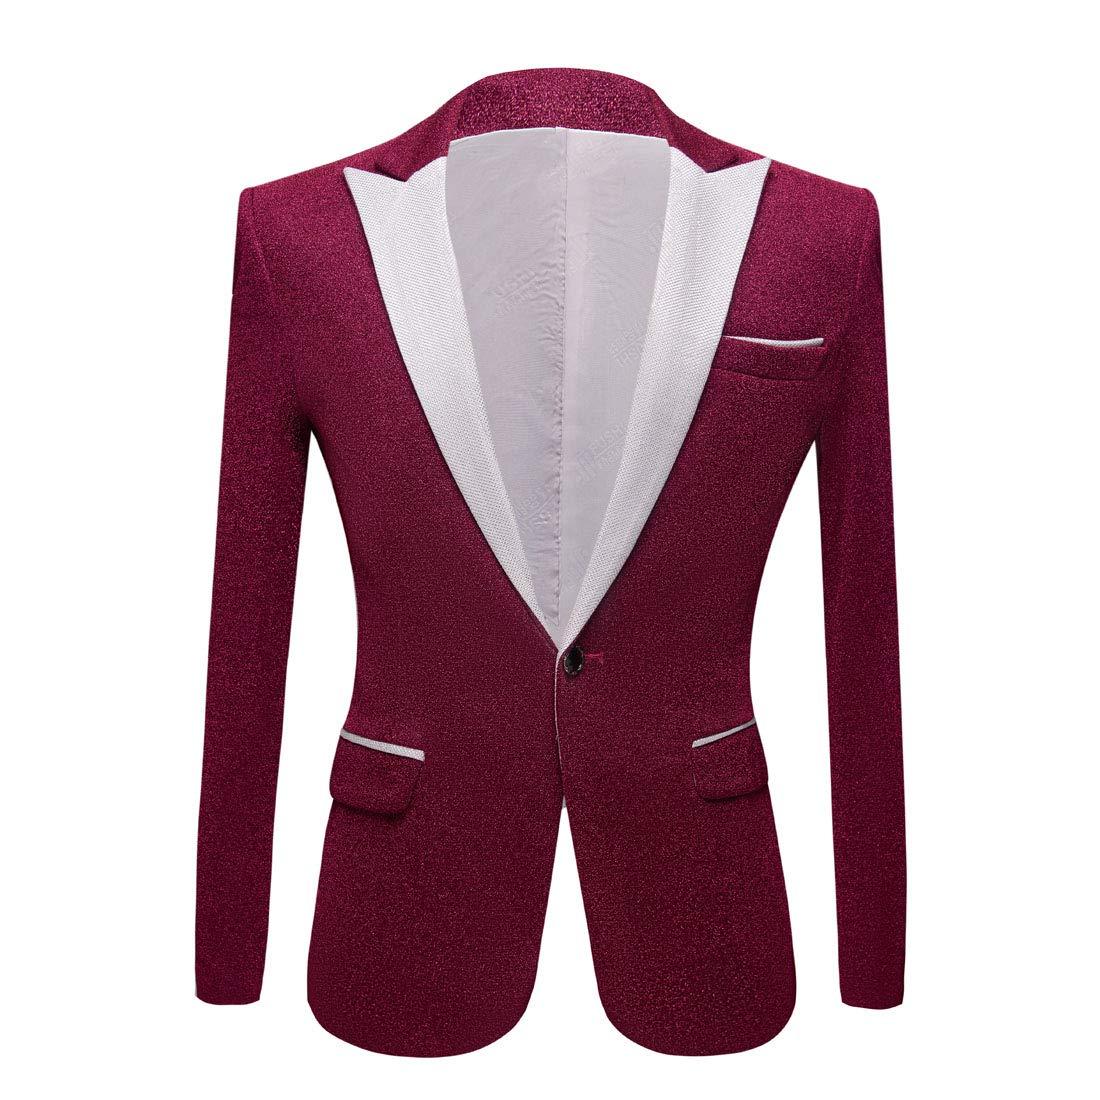 PYJTRL Men Fashion Shiny Blazer Wedding Grooms Prom Dress Suit Jacket